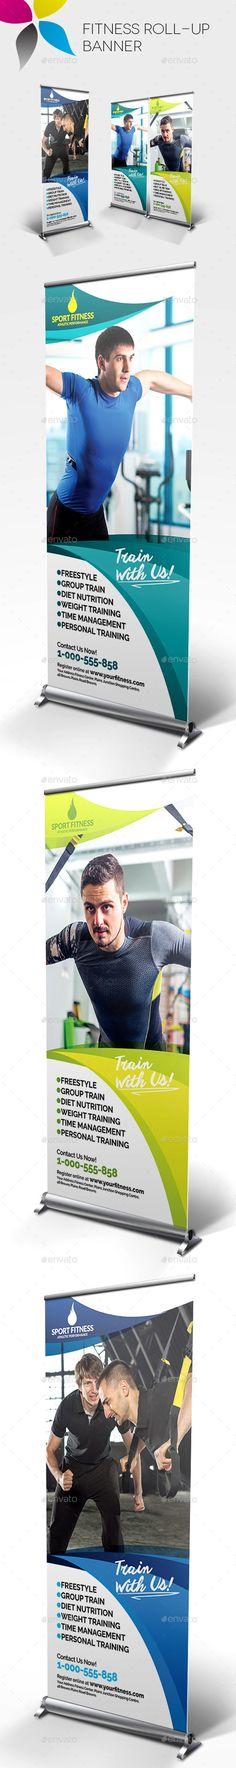 Fitness Roll-up Banner Template #design Buy Now: http://graphicriver.net/item/fitness-rollup-banner/12852919?ref=ksioks